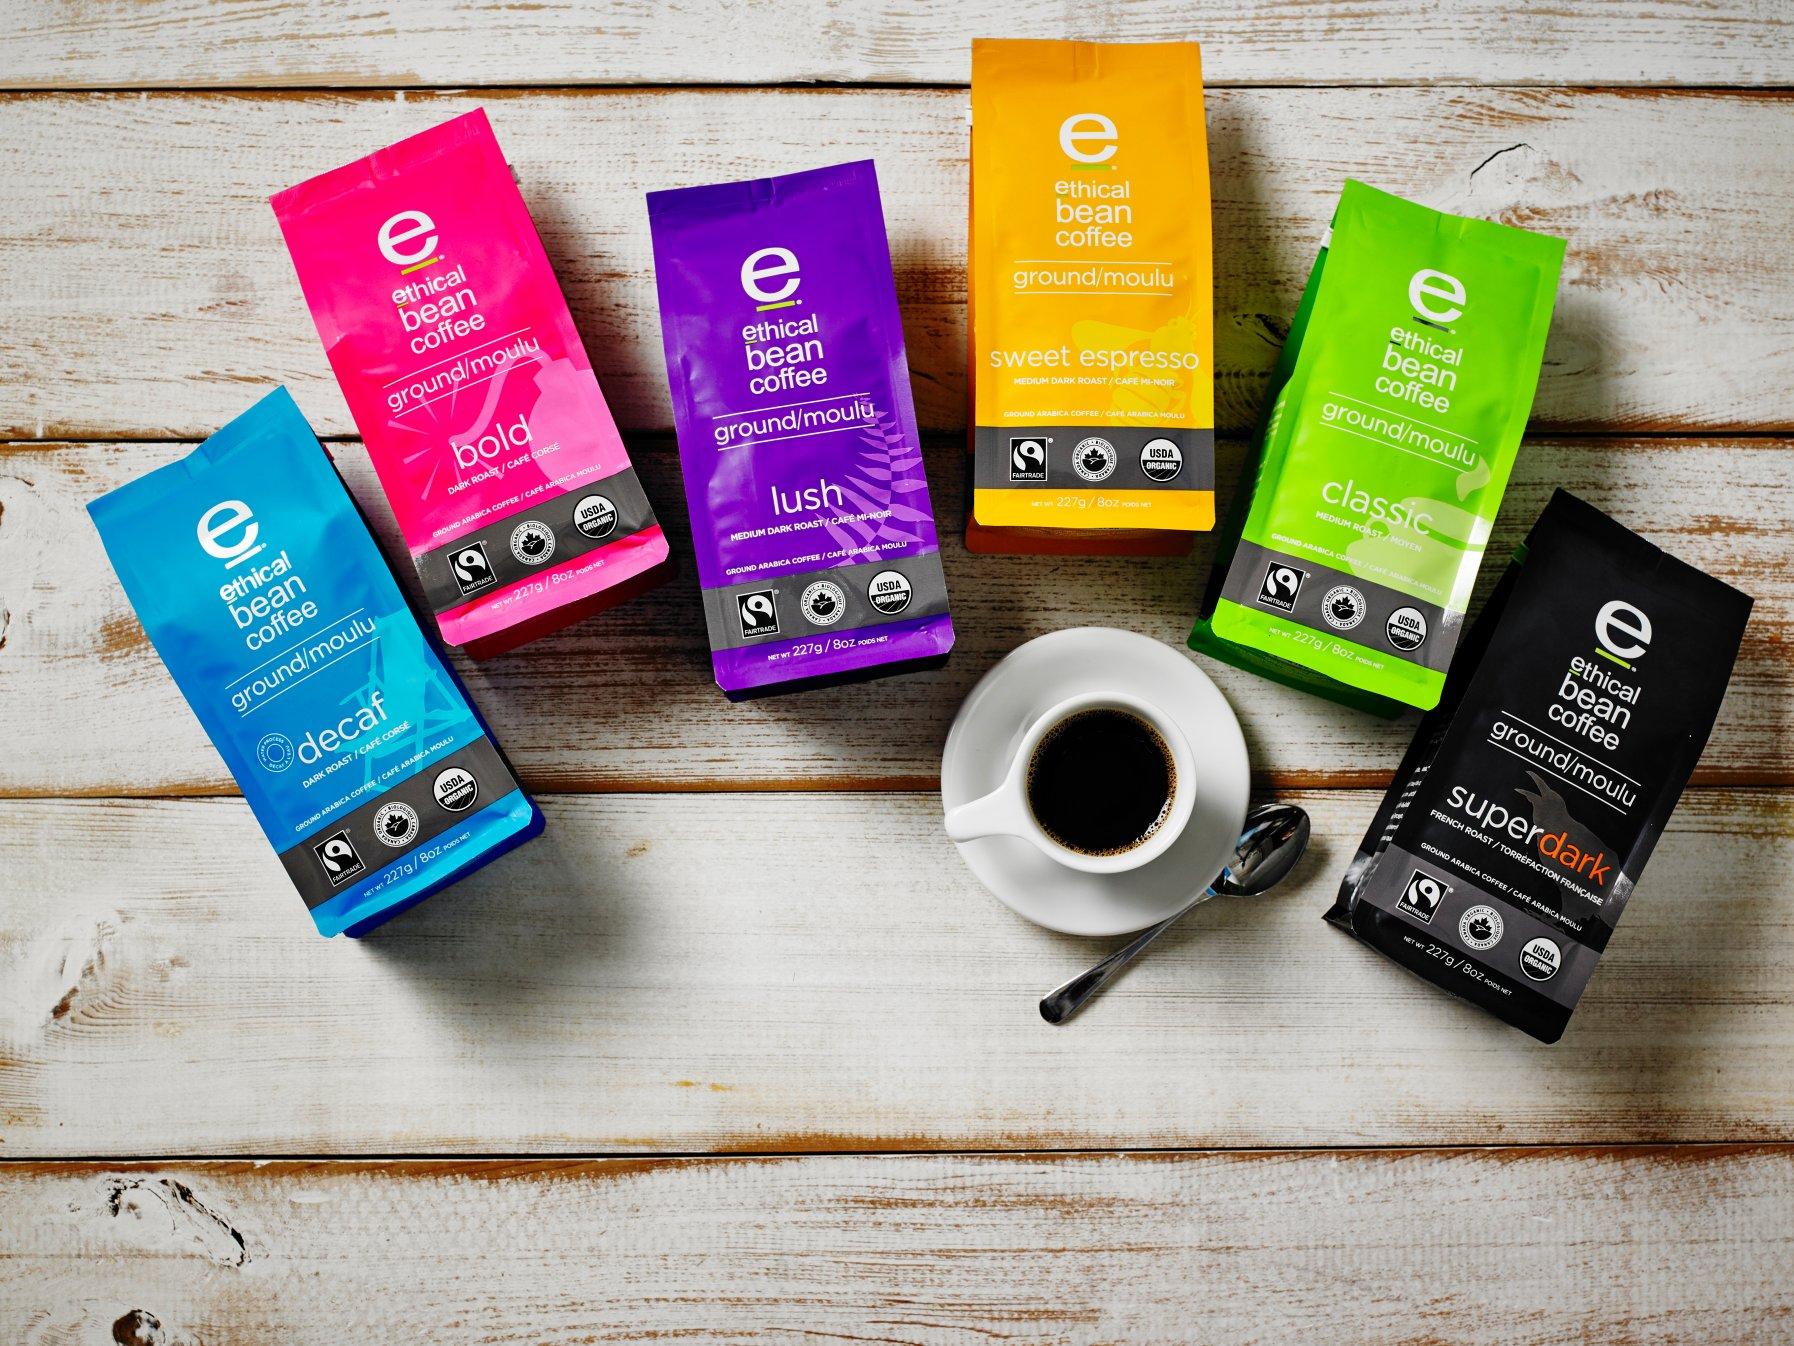 Ethical Bean coffee.